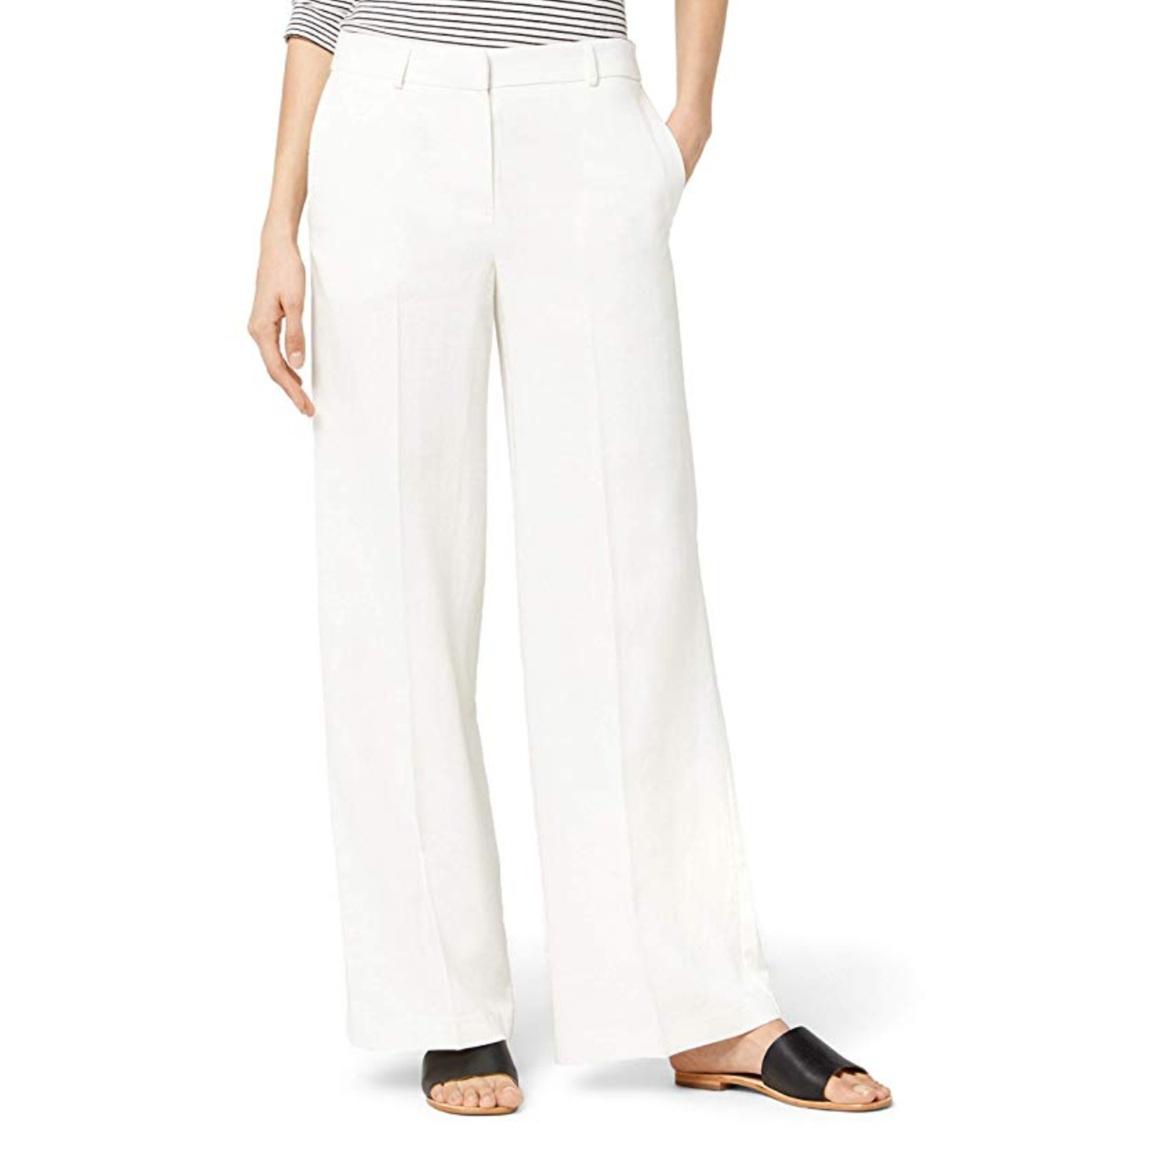 Pantaloni in lino -